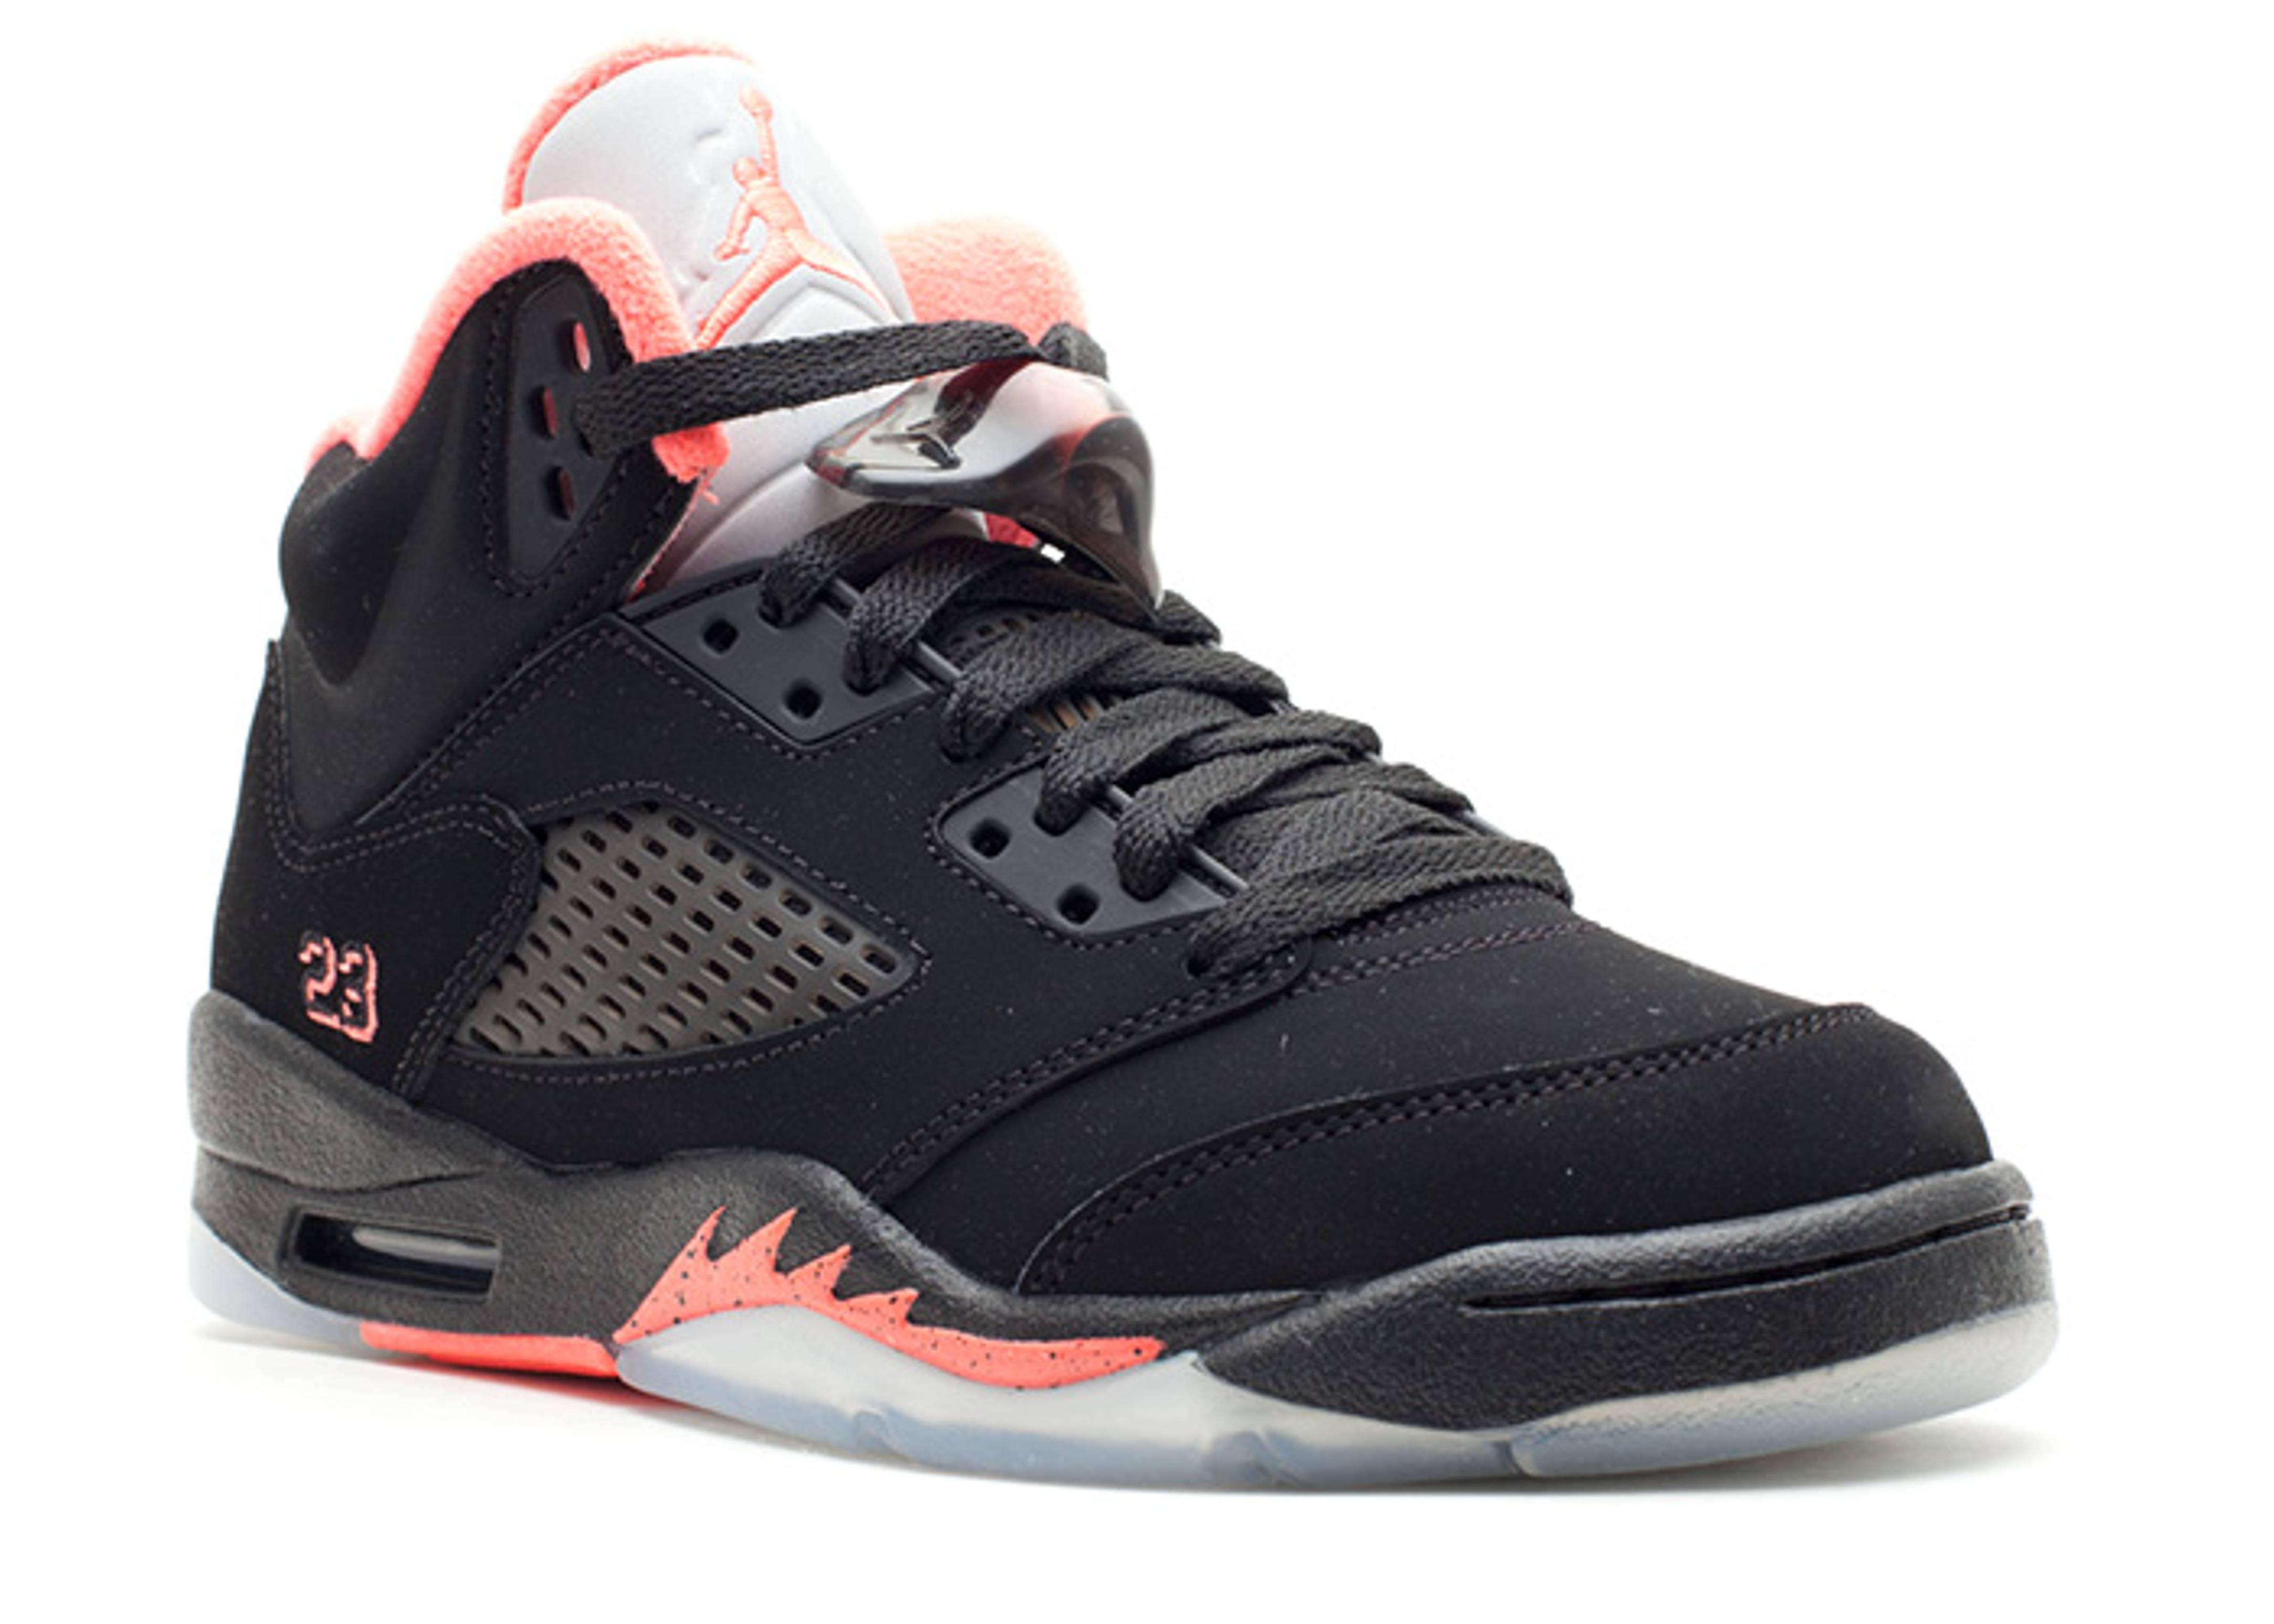 wholesale dealer 6967f 8af0e Girls Air Jordan 5 Retro (gs) - Air Jordan - 440892 001 - black alarming    Flight Club